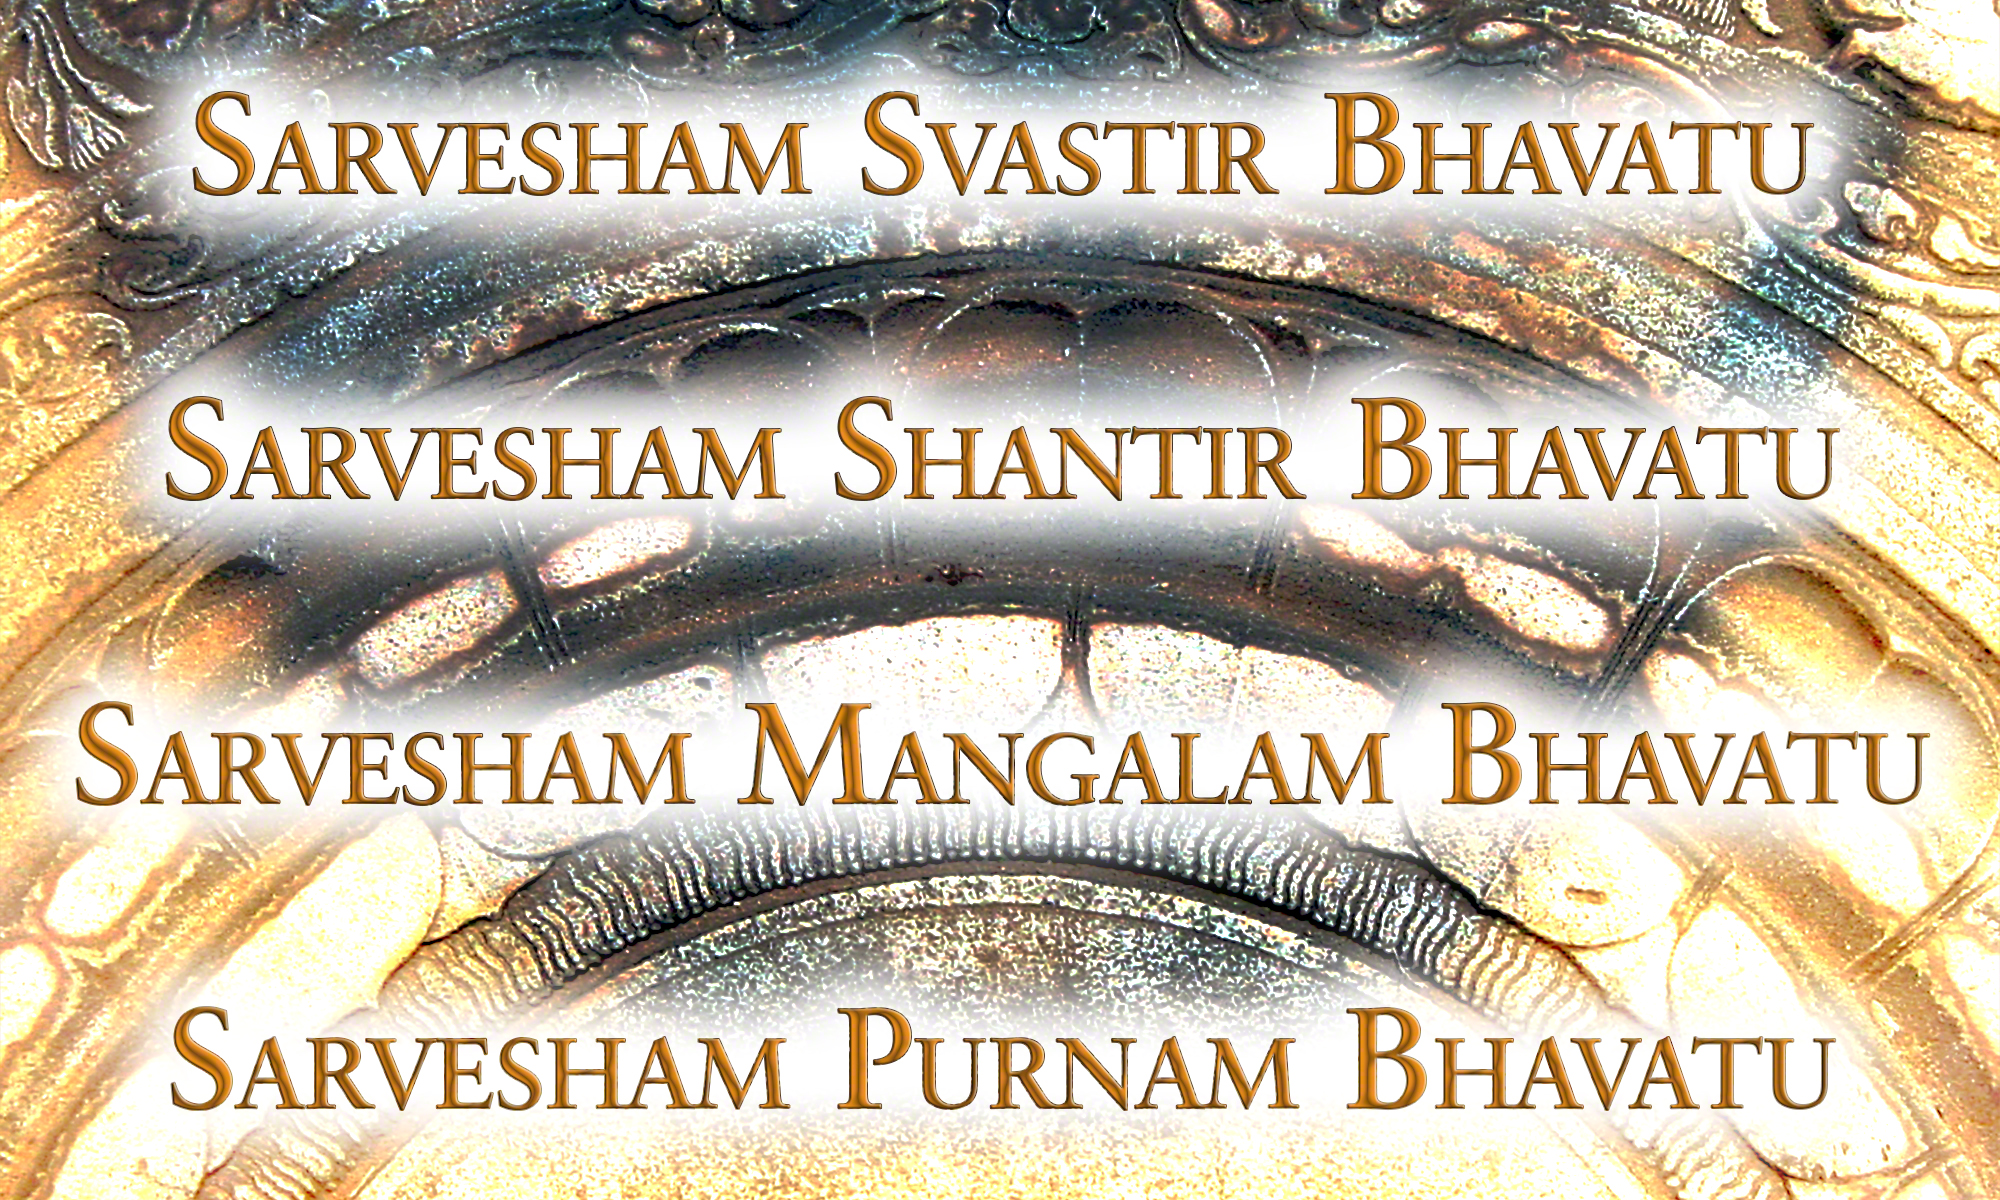 Om Shanti Mantra For Peace Lyrics & Meaning Sarvesham